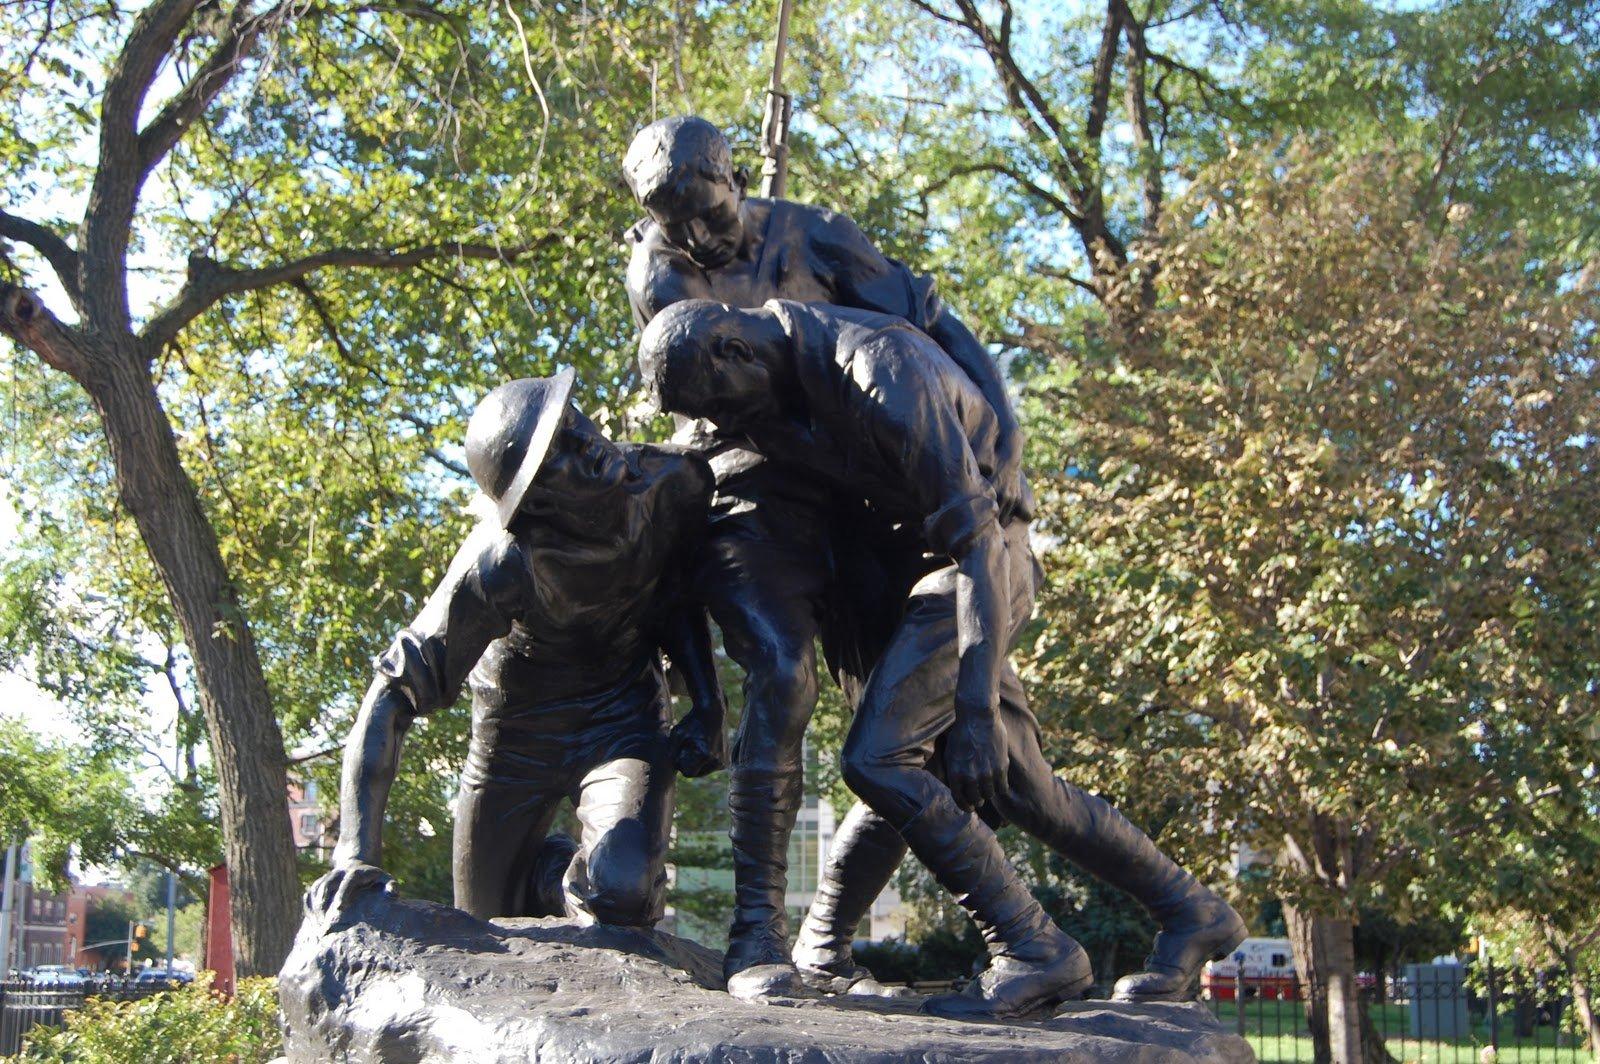 The bronze figures of the Washington Heights - Inwood War Memorial, sculpted by Gertrude Vanderbilt Whitney